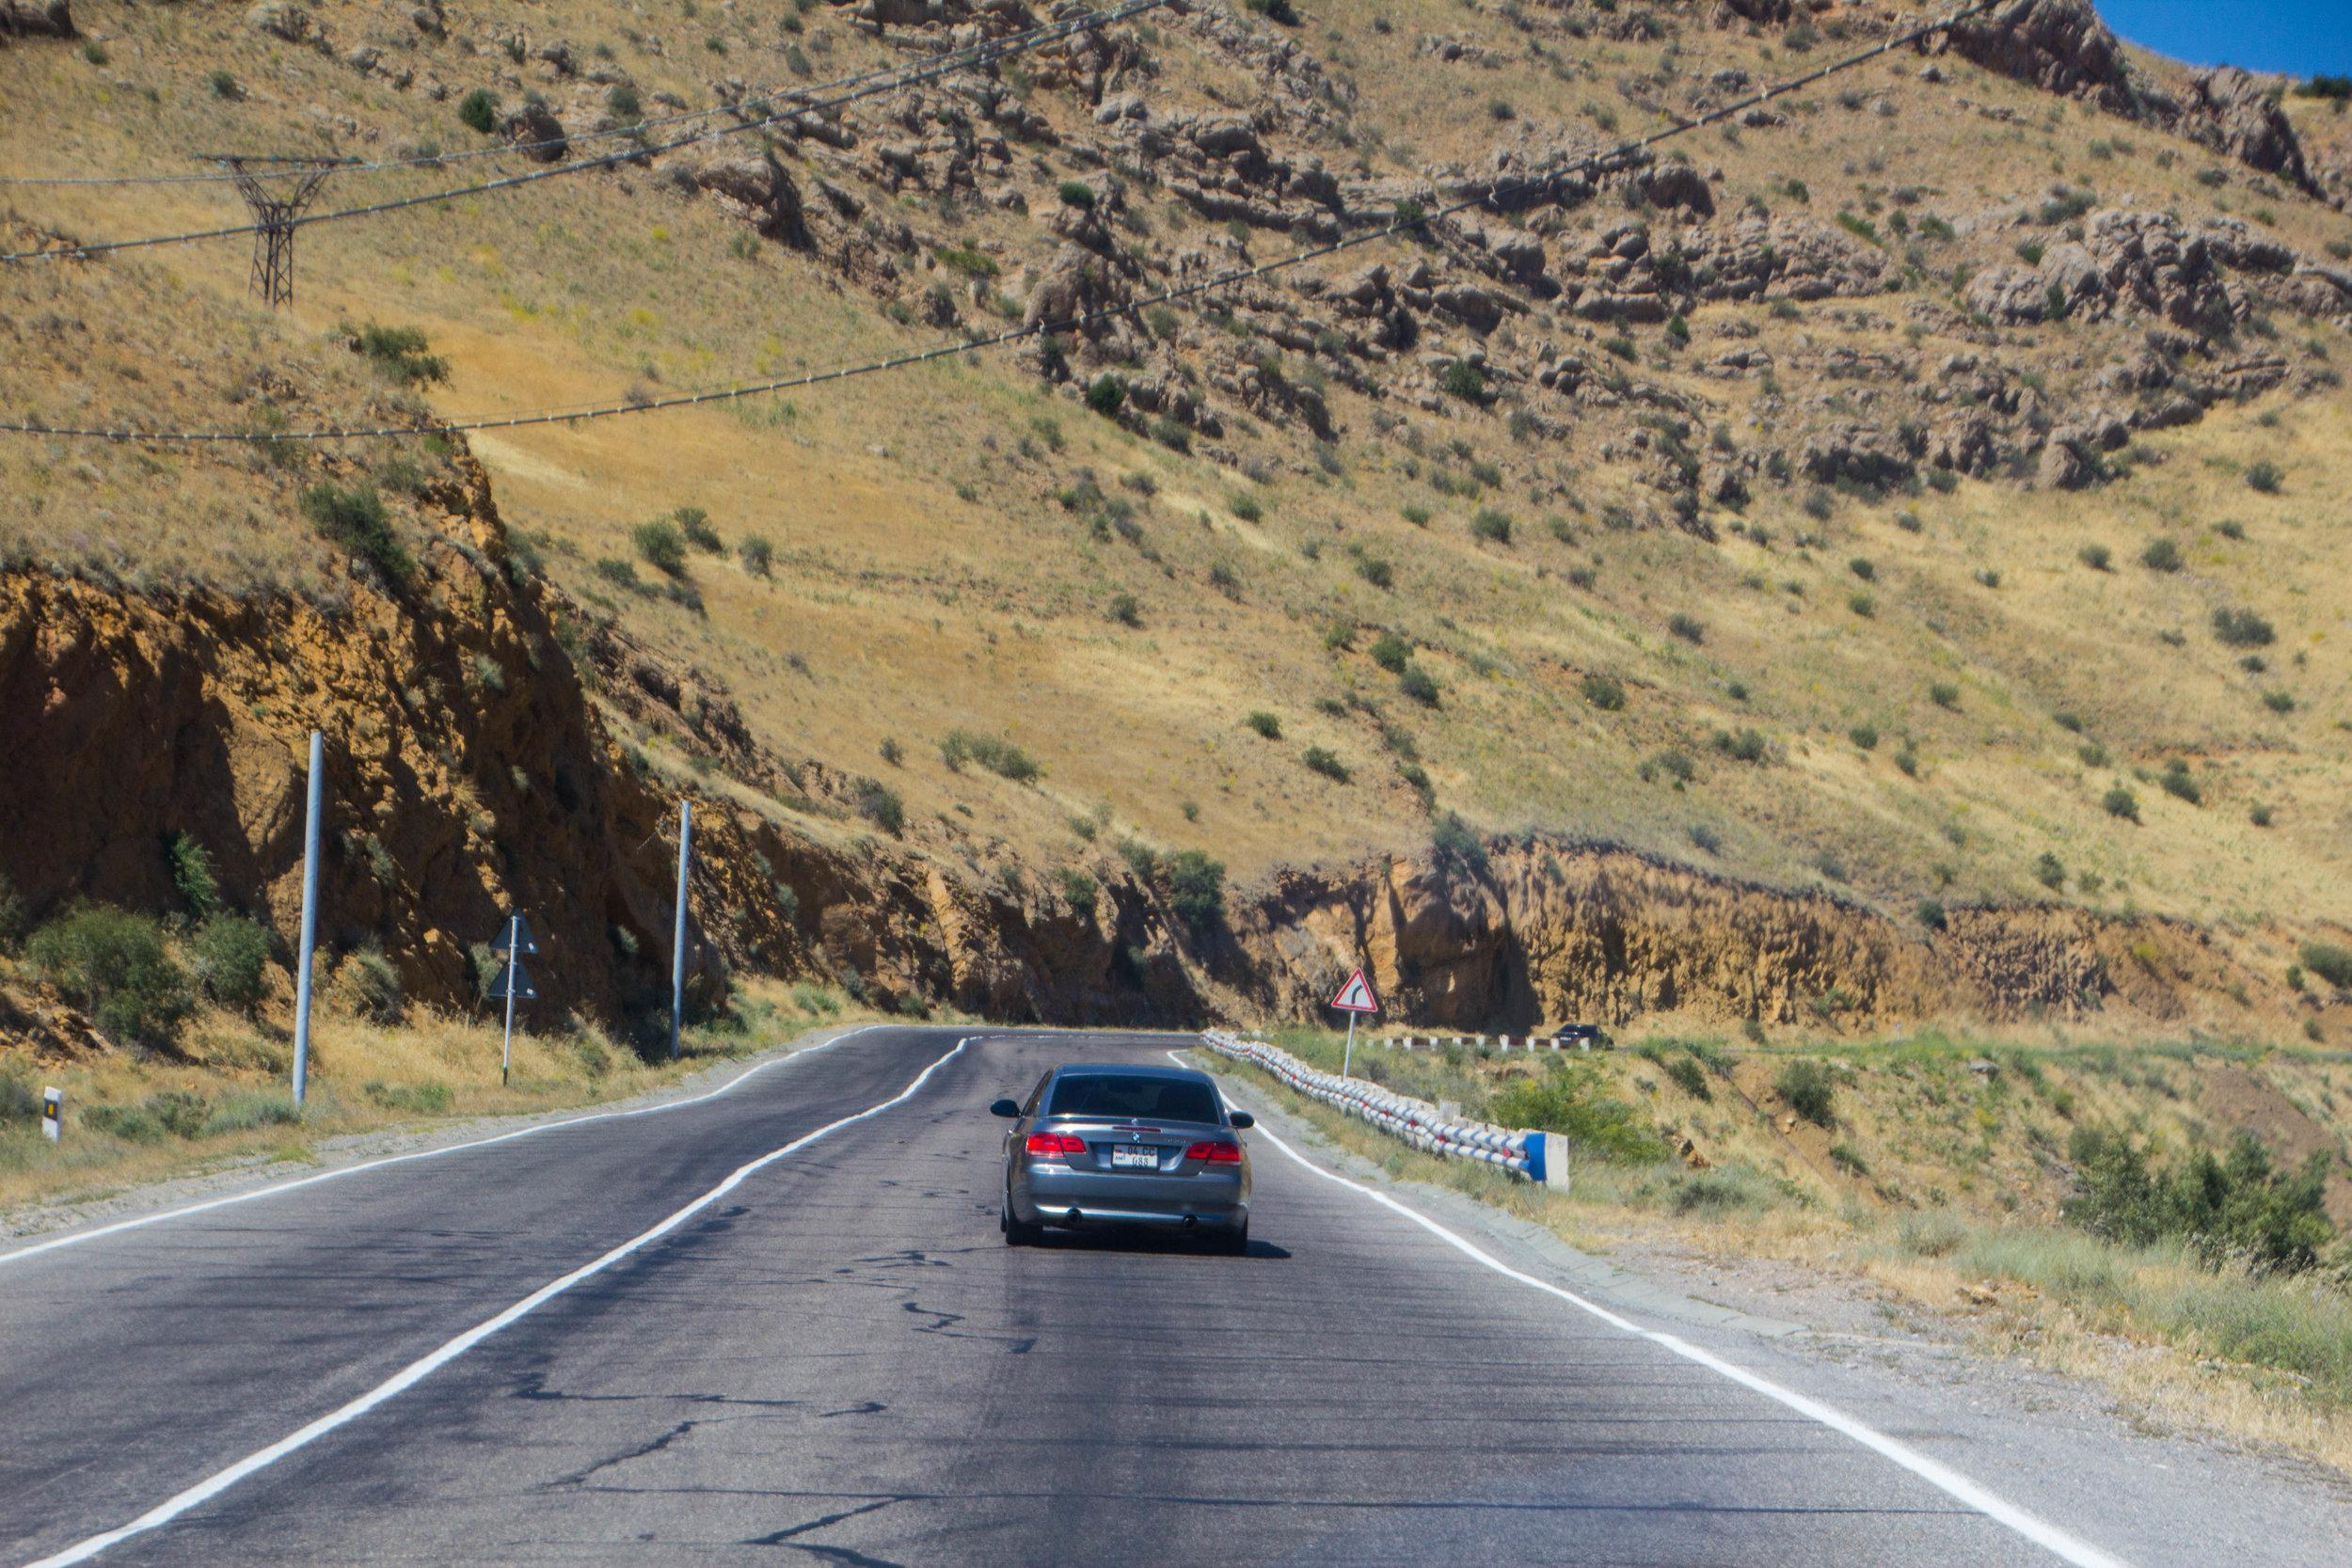 armenia-azerbaijan-southern-border-19.jpg